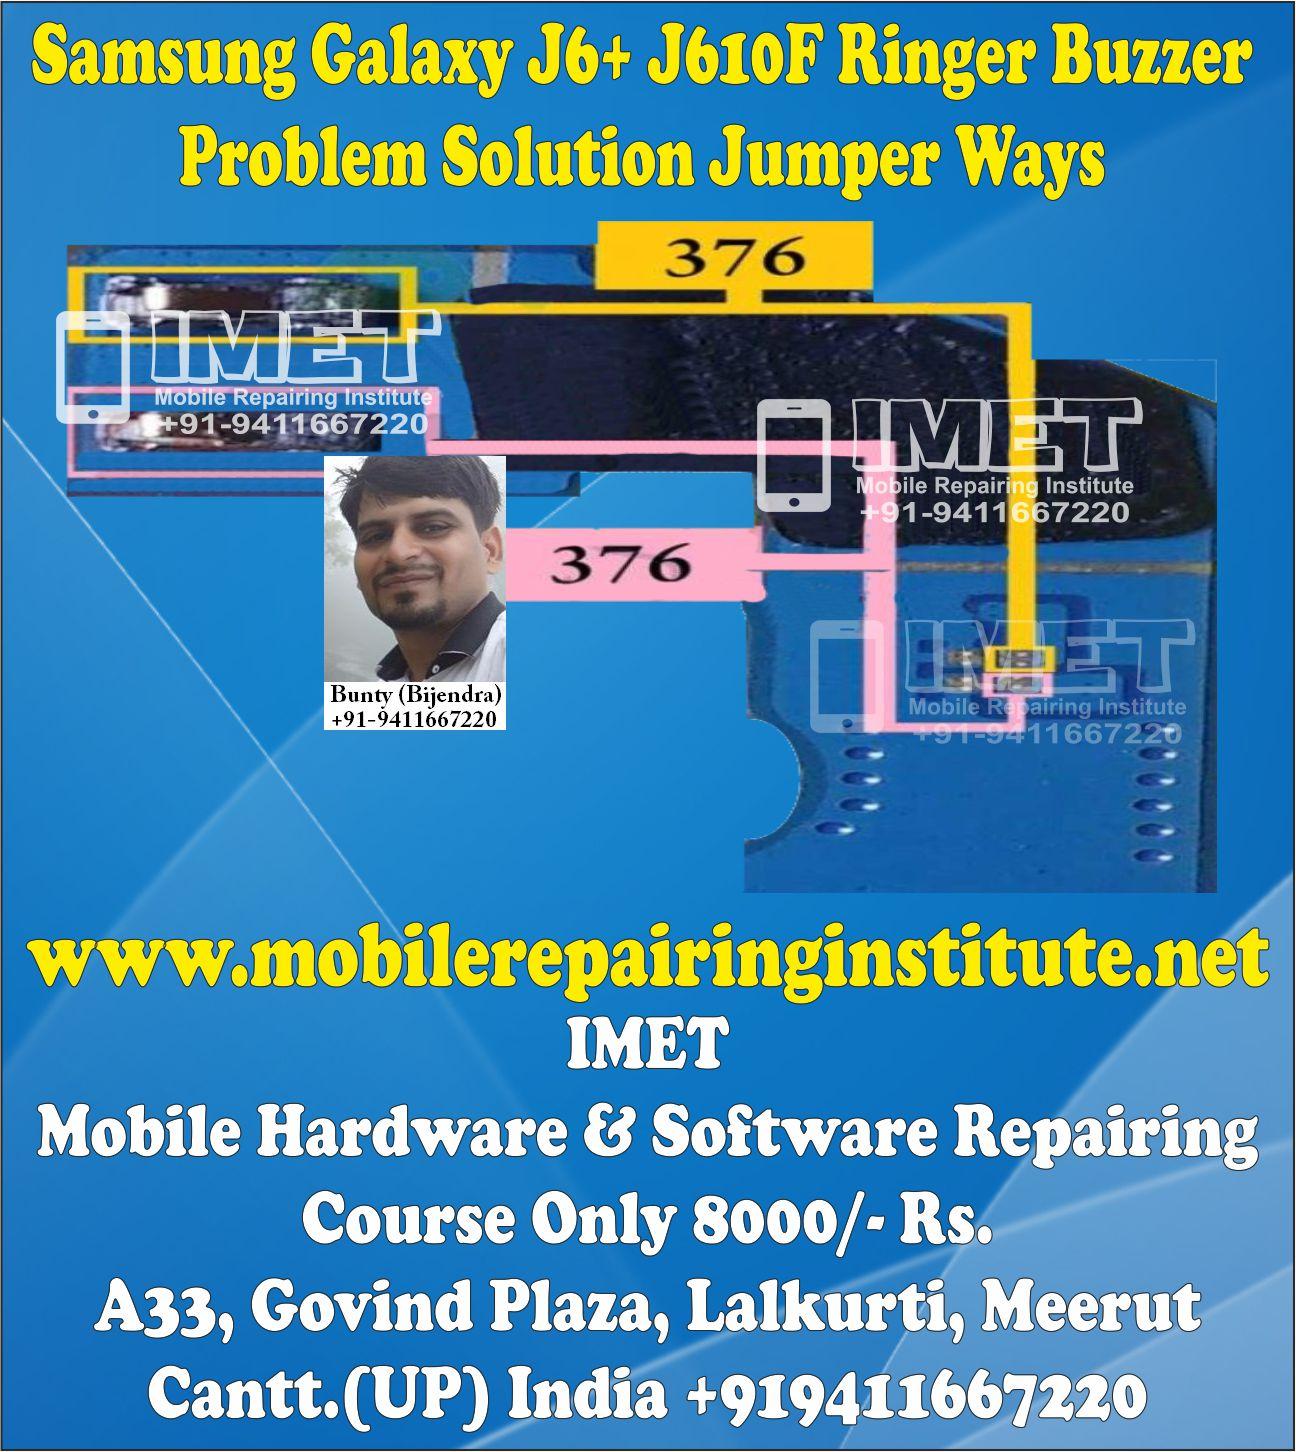 Samsung Galaxy J6+ J610F Ringer Buzzer Problem Solution Jumper Ways